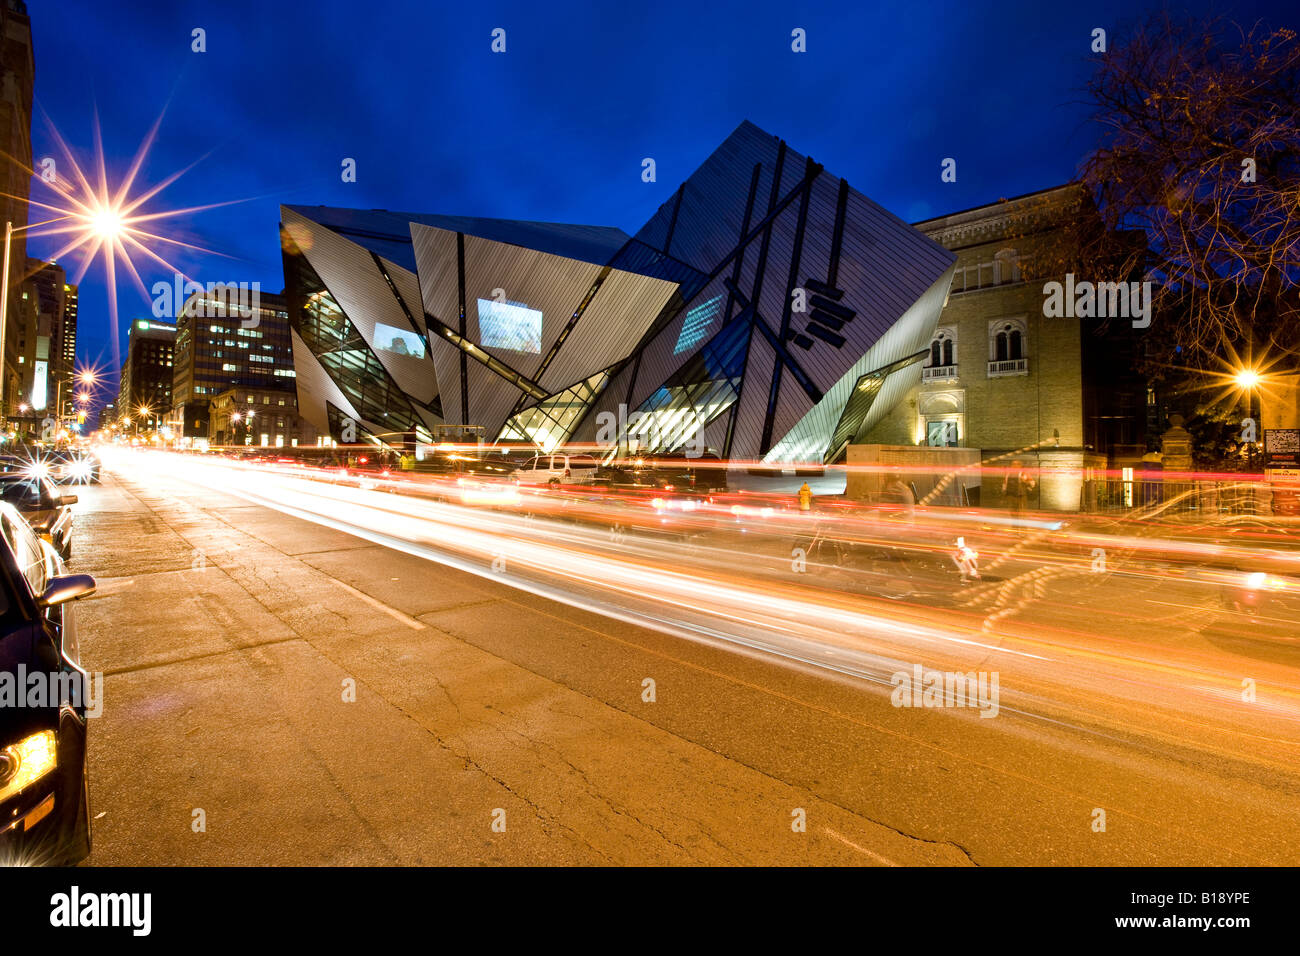 new 'Crystal' addition to ROM (Royal Ontario Museum), Toronto, Ontario, Canada. - Stock Image